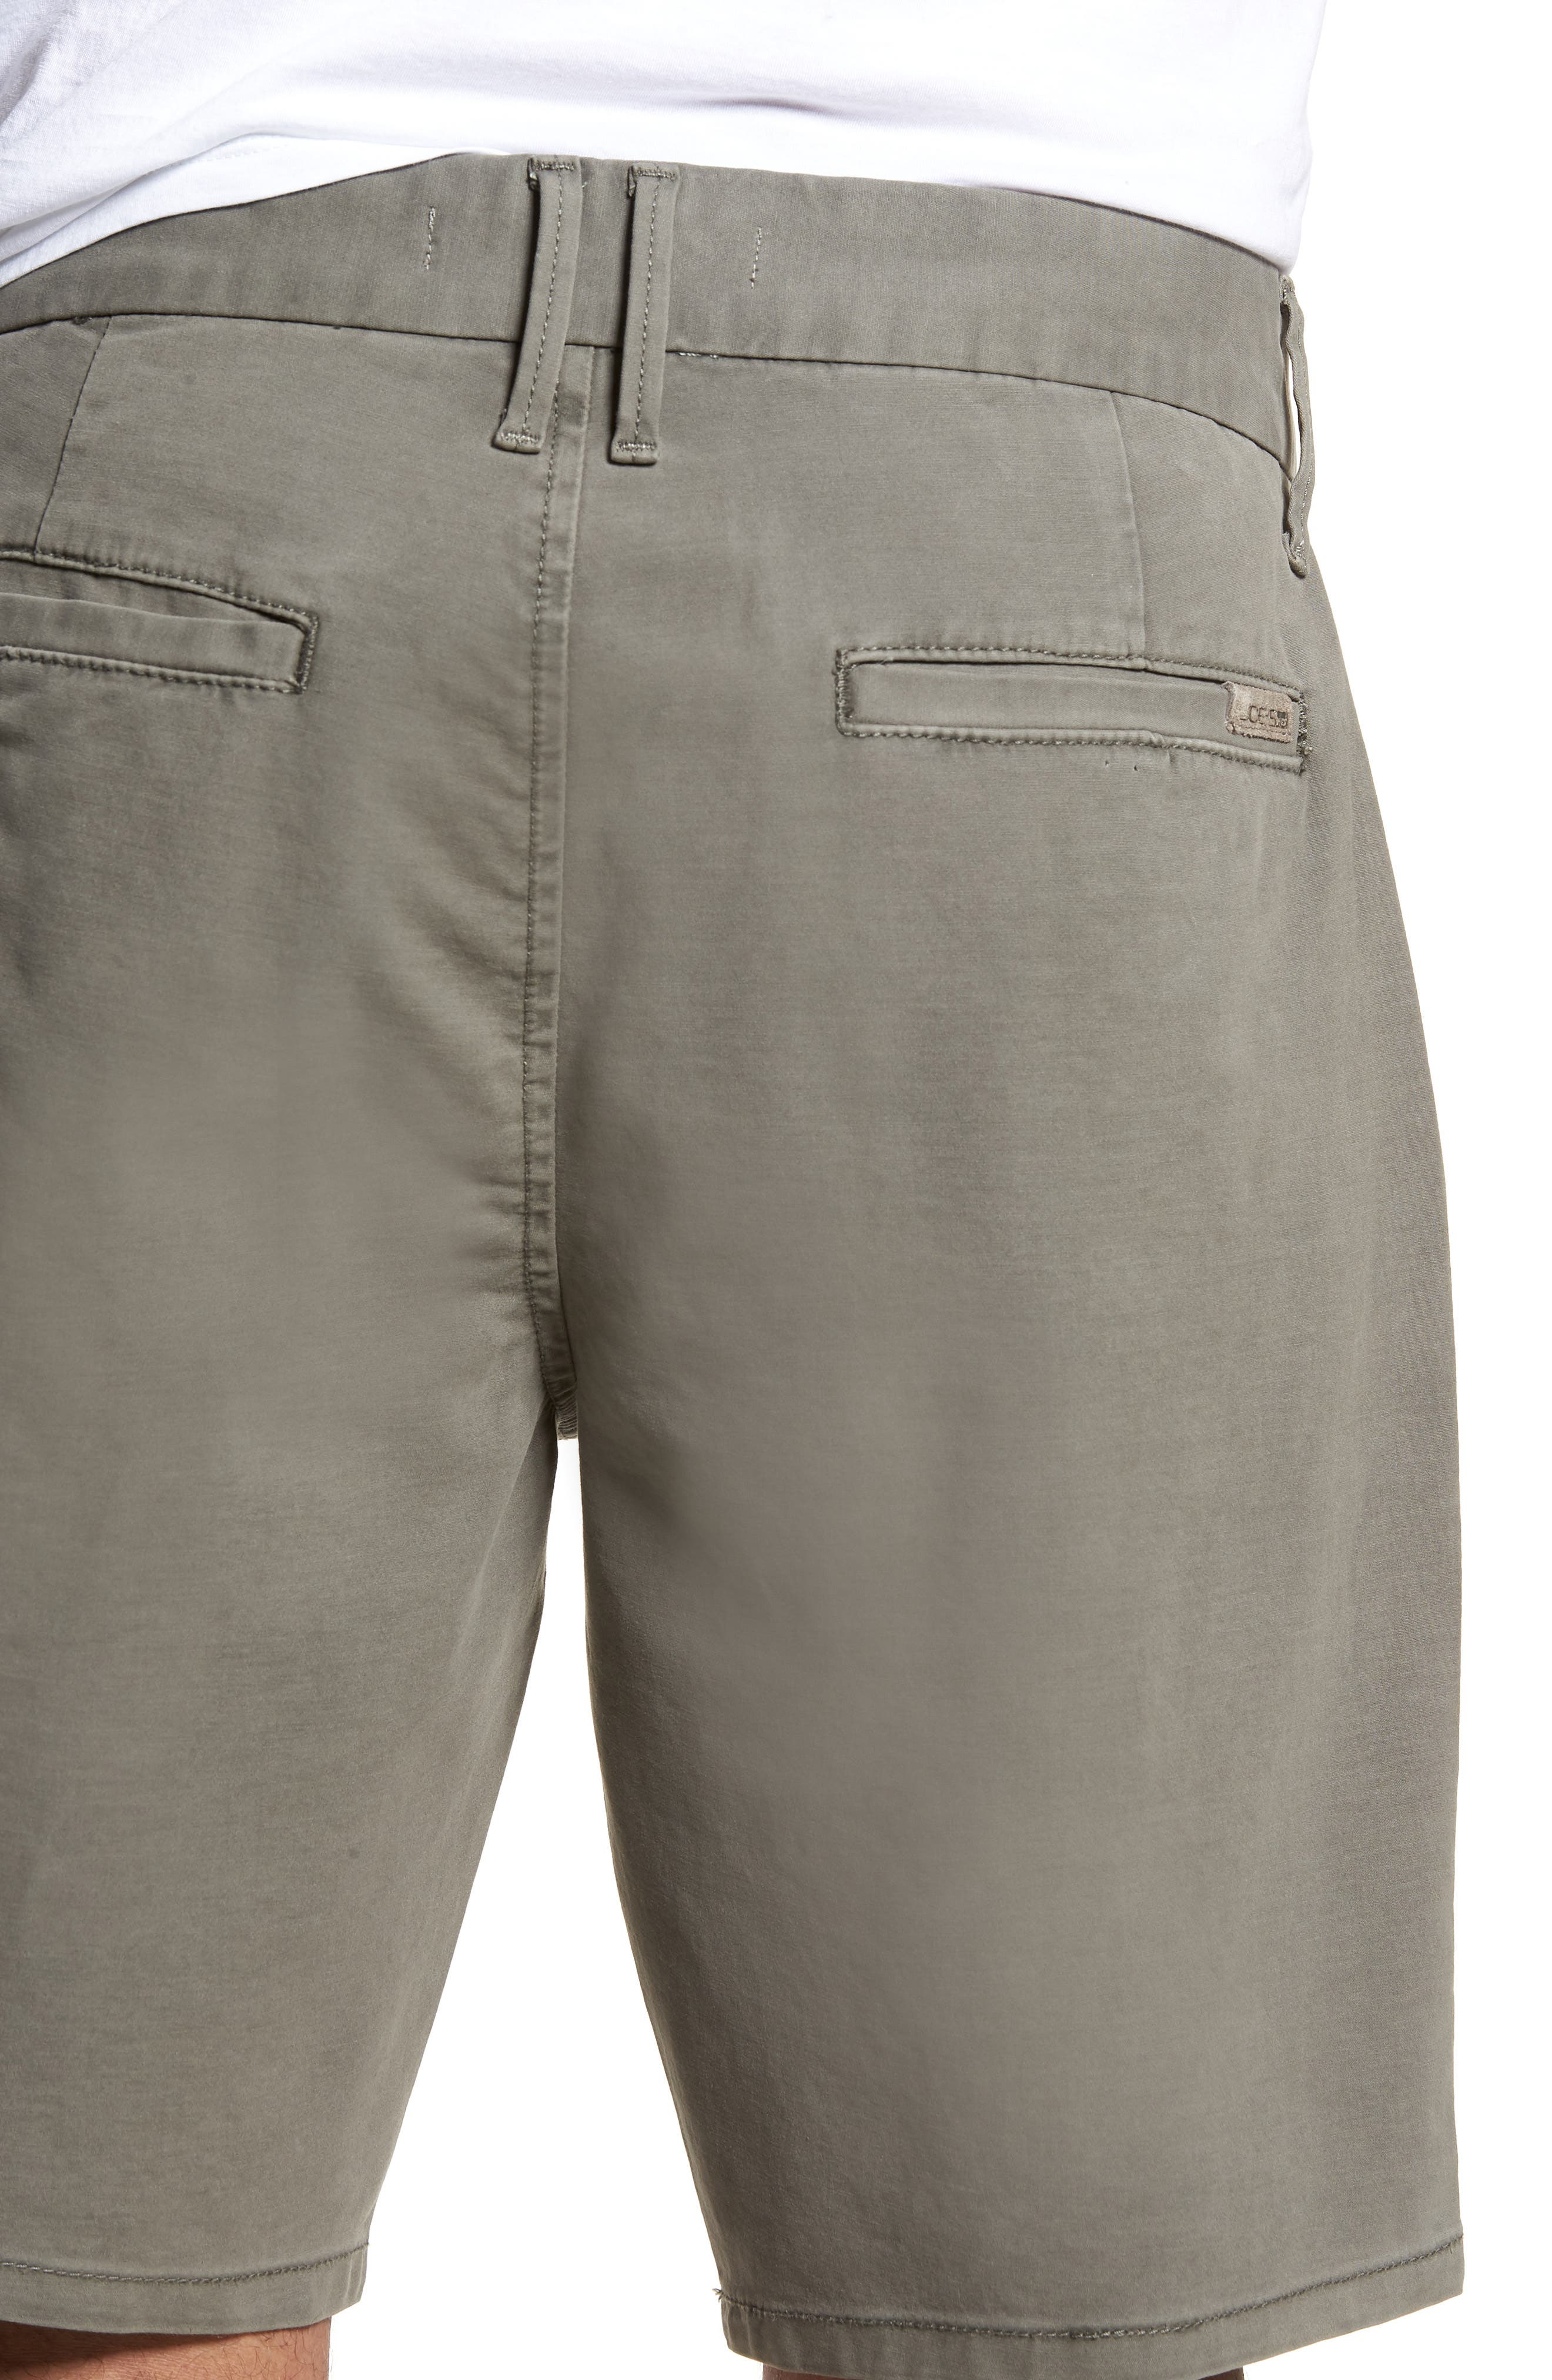 Brixton Trim Fit Straight Leg Shorts,                             Alternate thumbnail 4, color,                             020